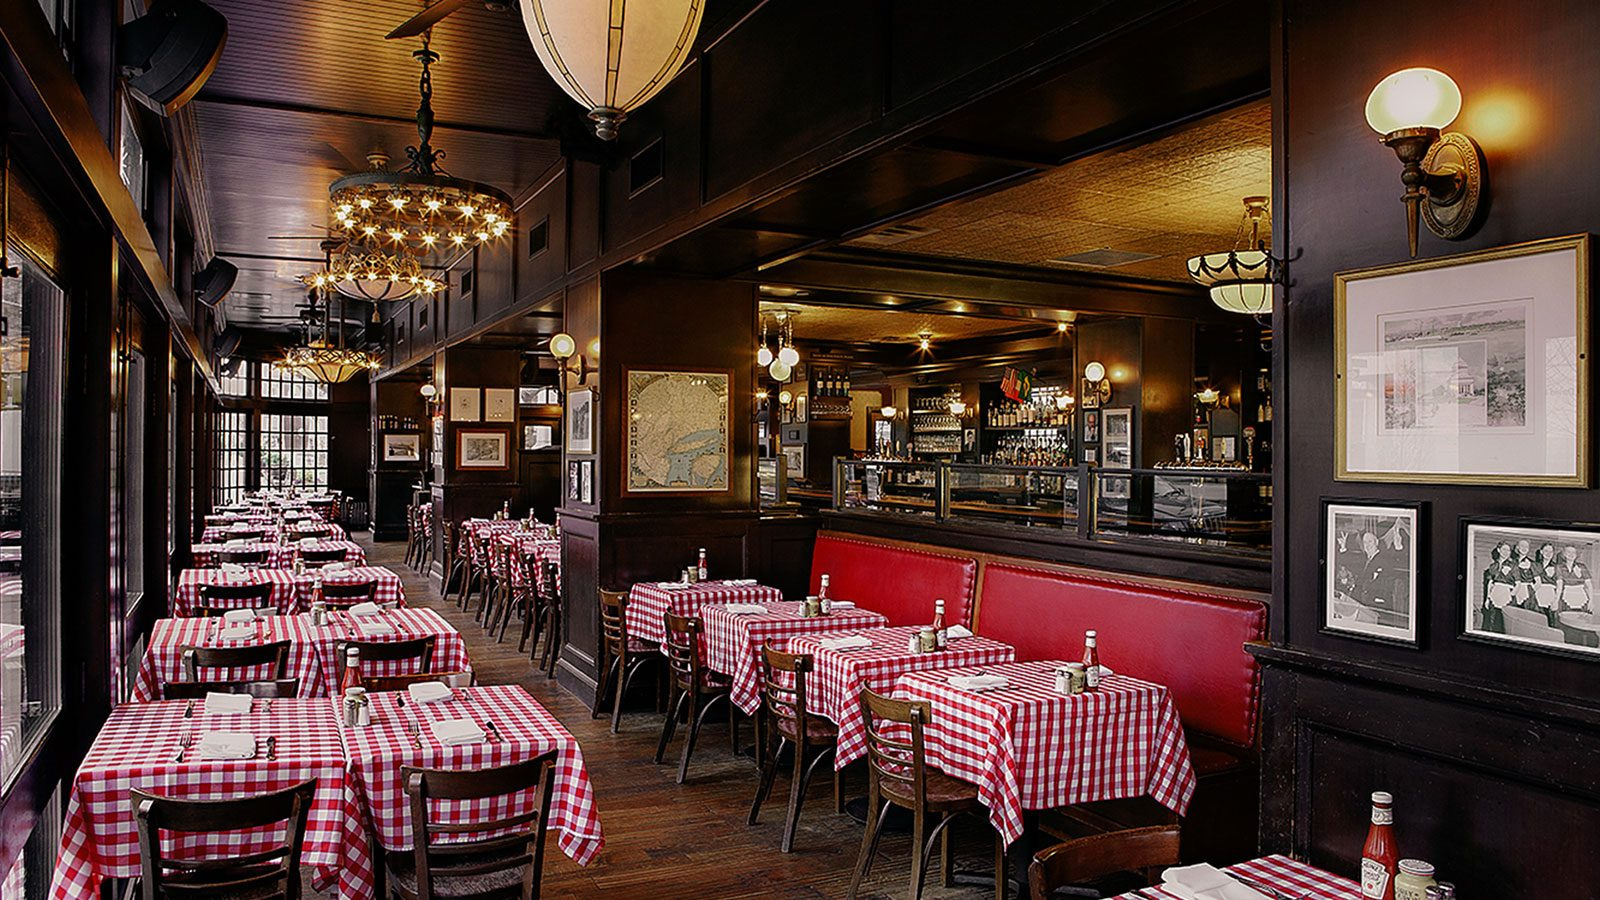 PJ Clarkes Restaurant And Bar